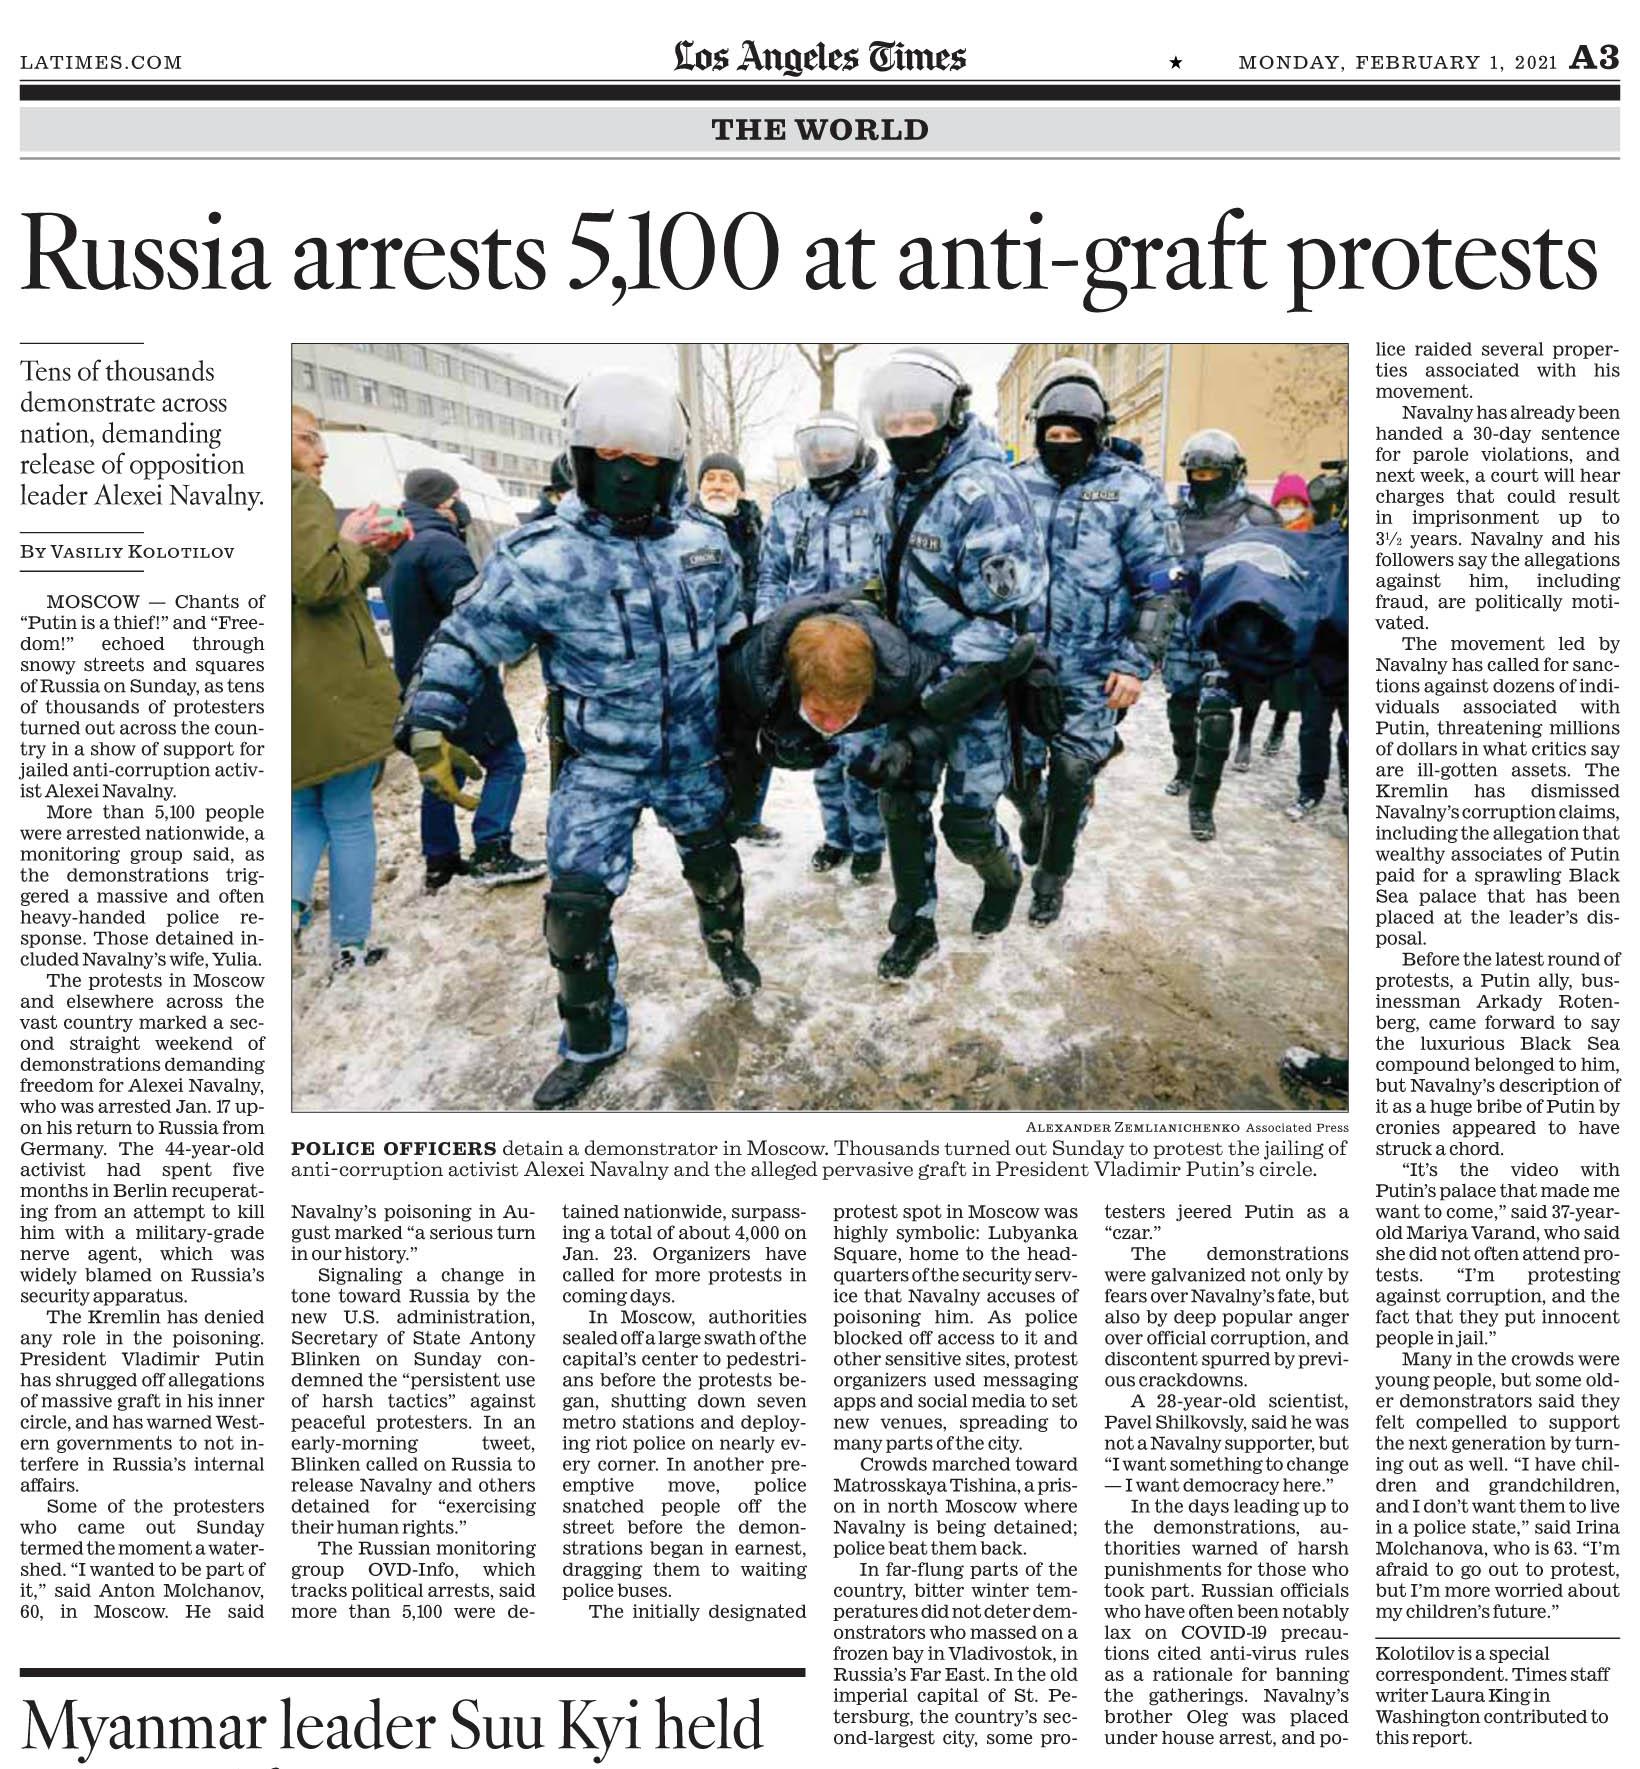 210201 LATimes Russia.jpg